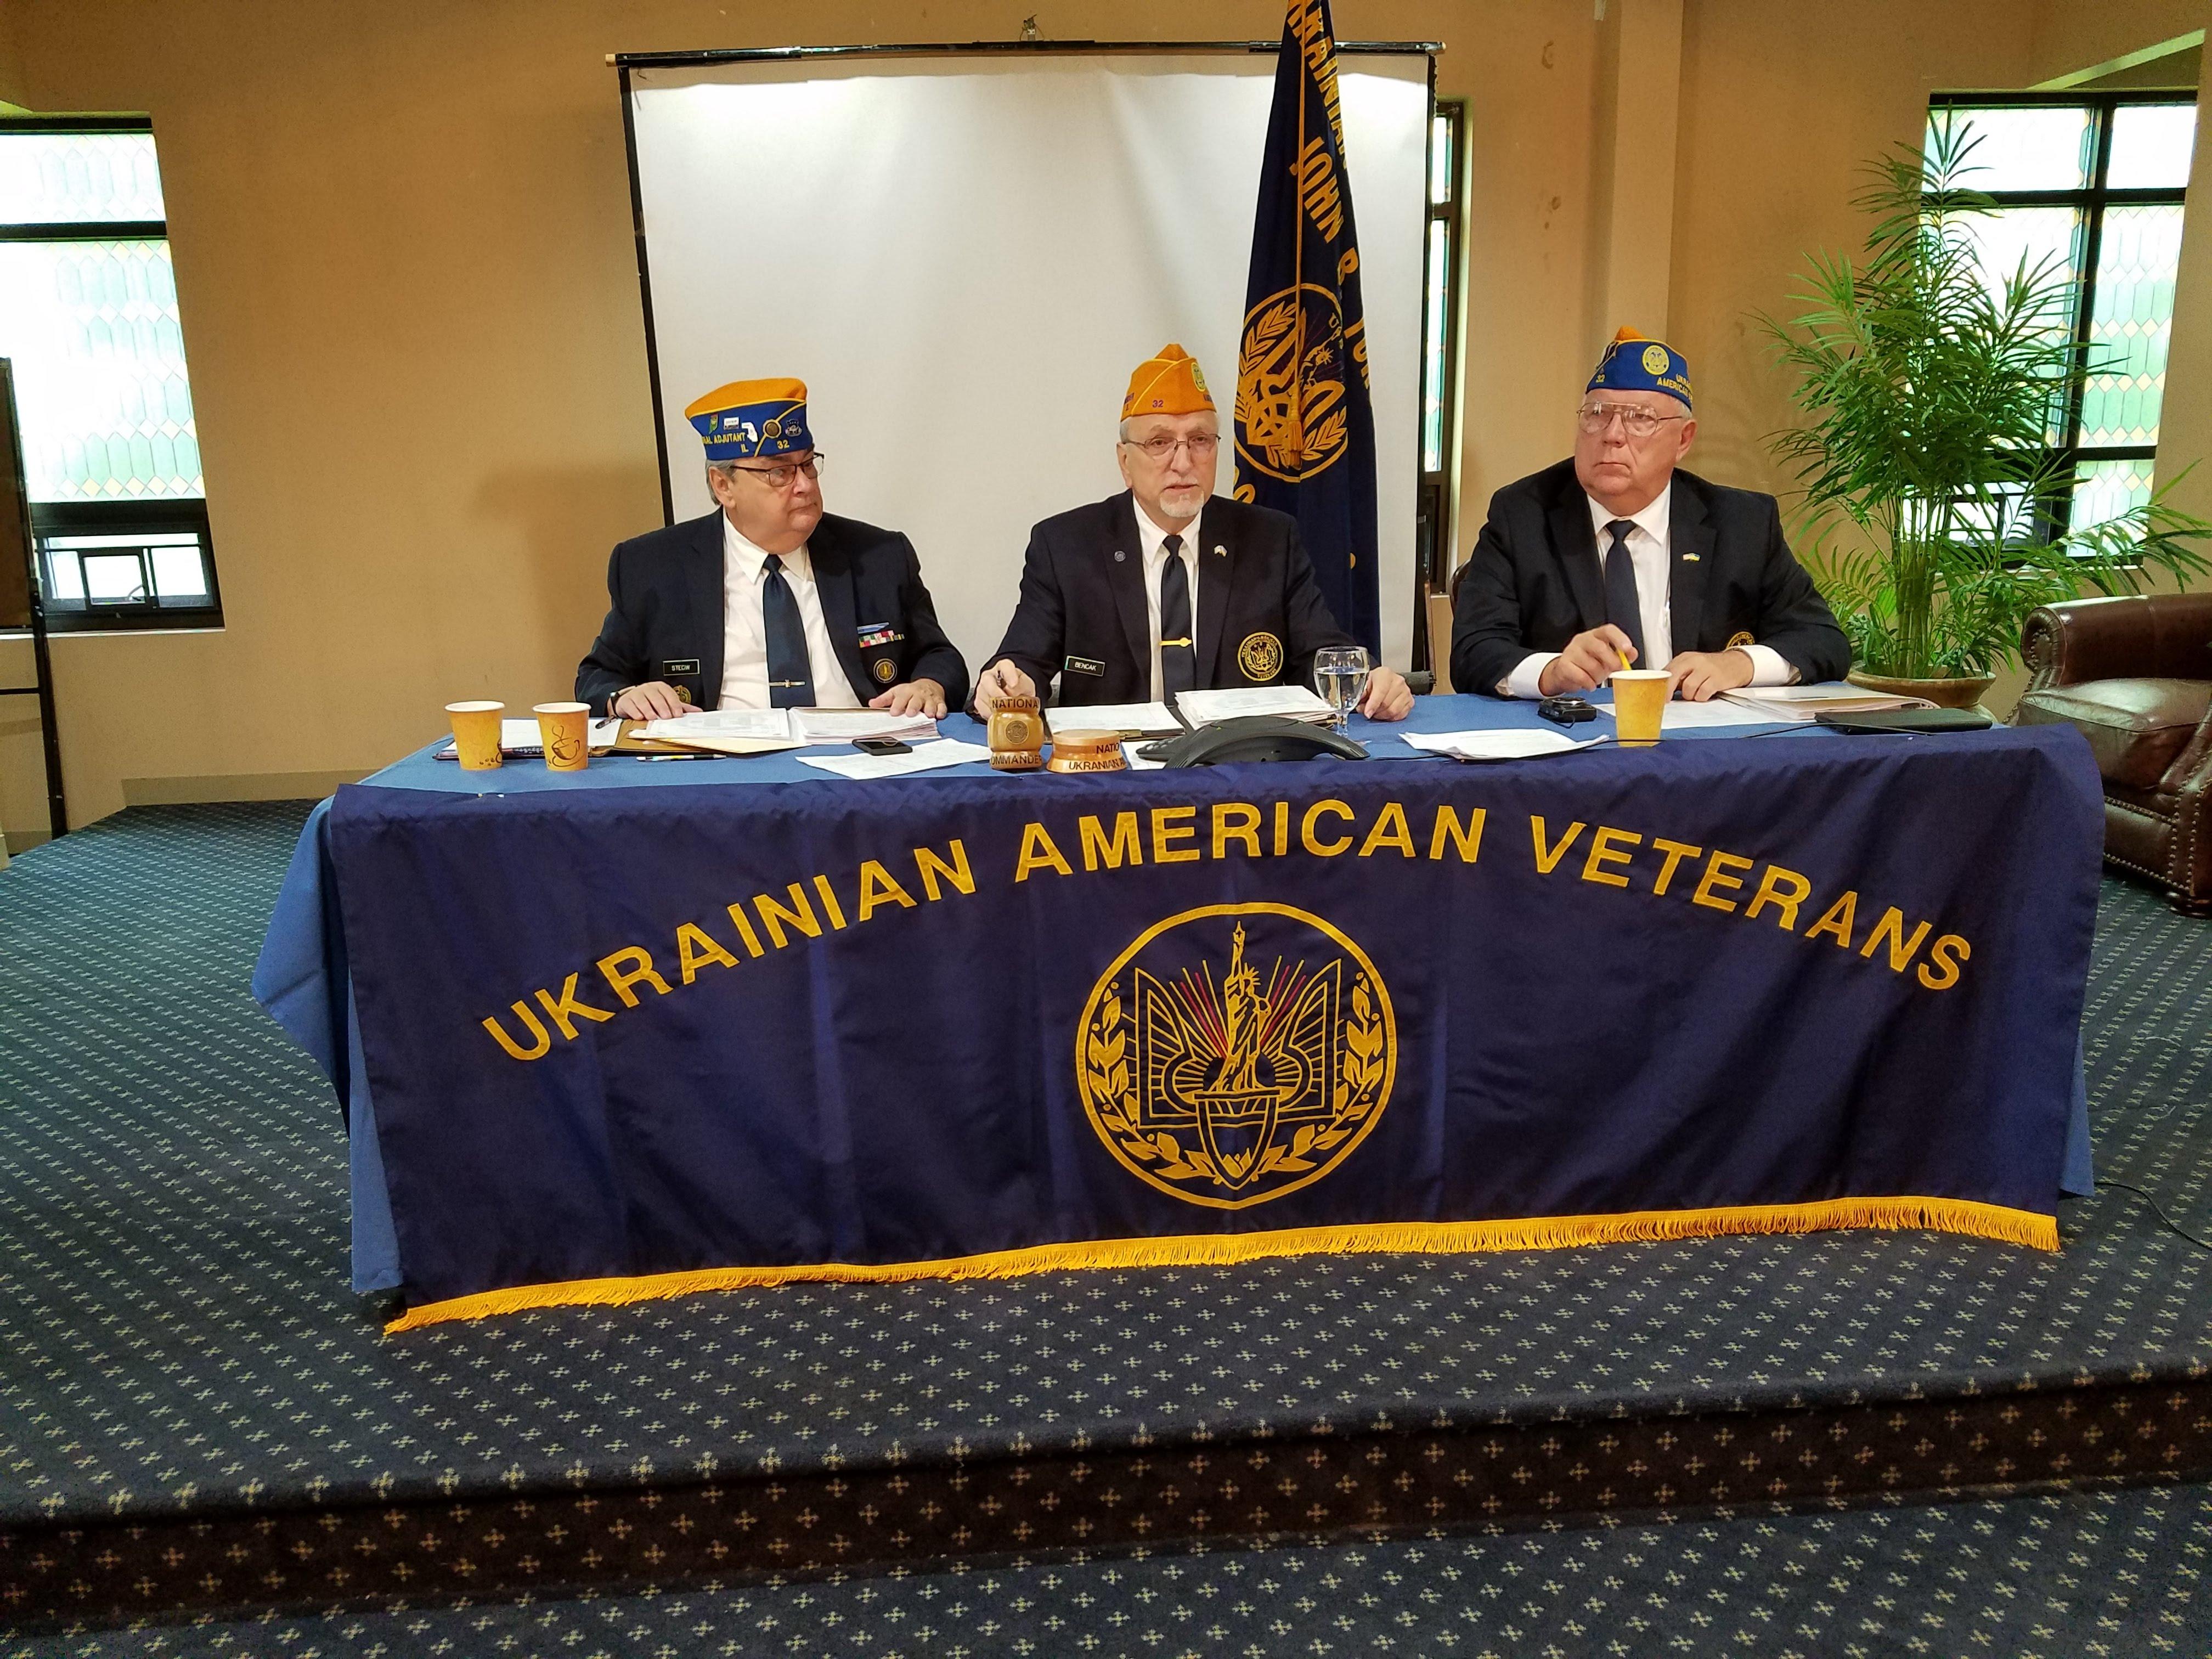 Ukrainian American Veterans (UAV) officers seated behind UAV banner